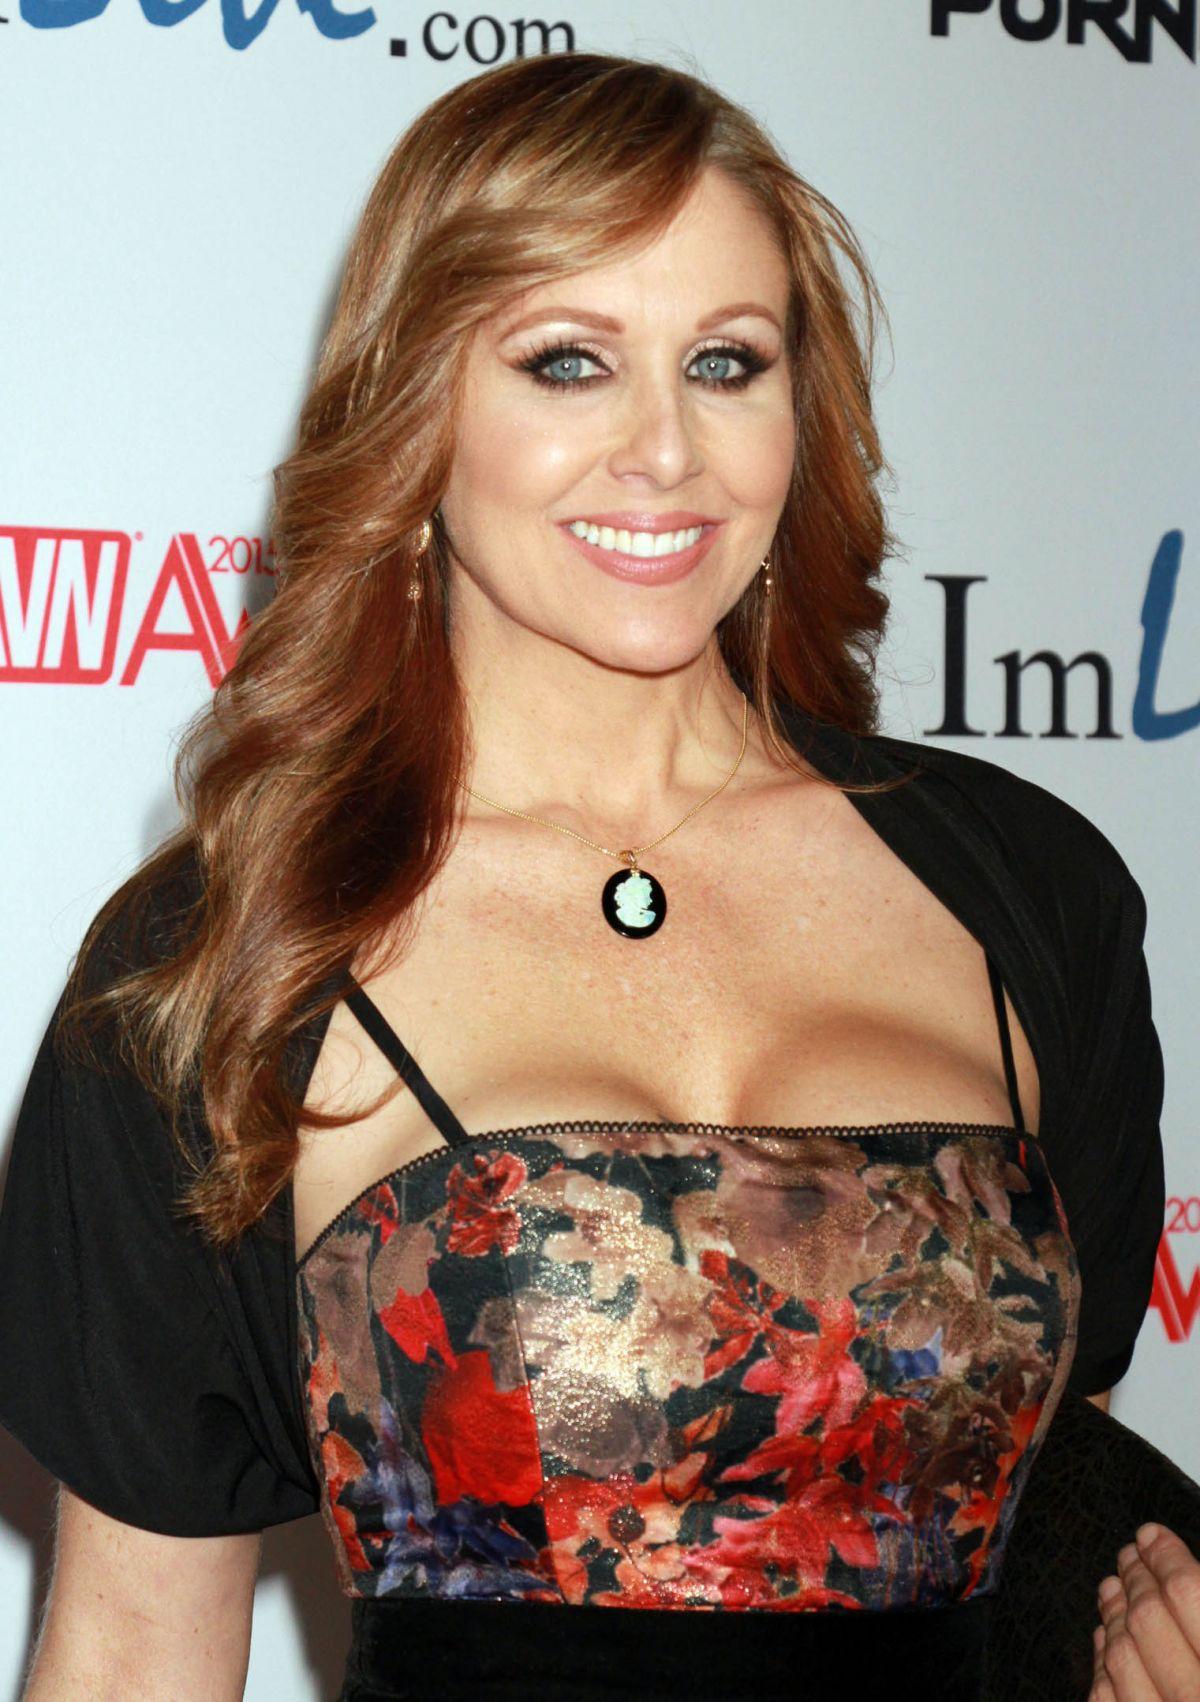 JULIA ANN at 2015 AVN Awards in Las Vegas